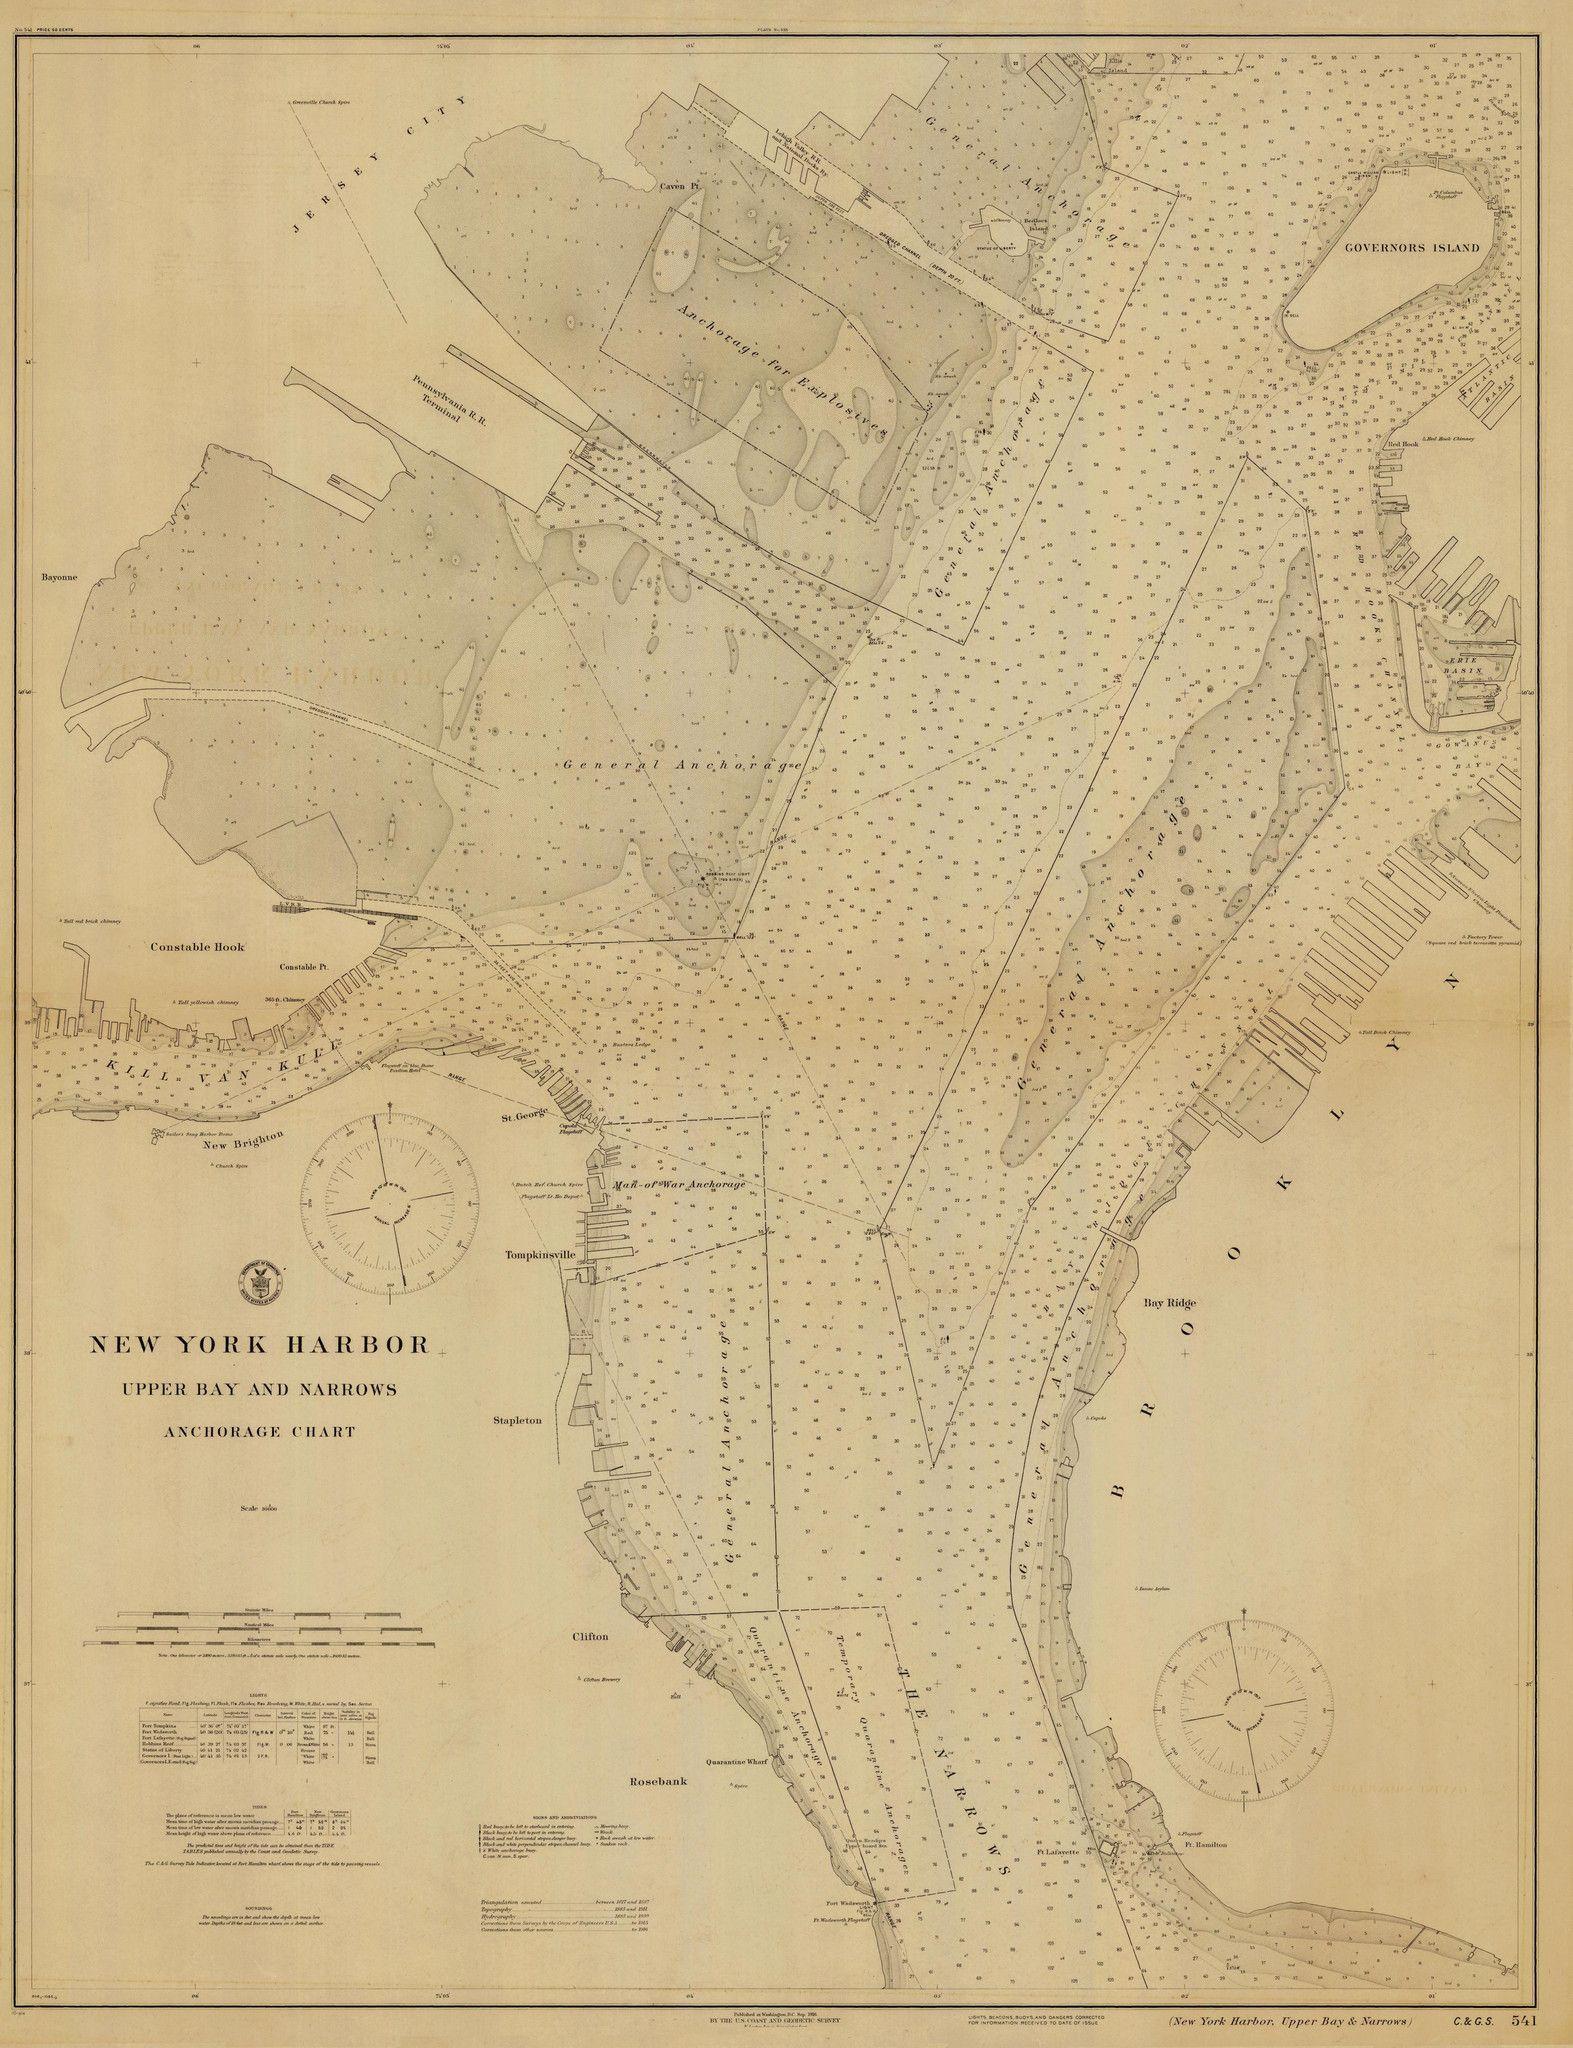 Map Of New York Harbour.New York Harbor Historical Map 1916 Maps Historical Maps New